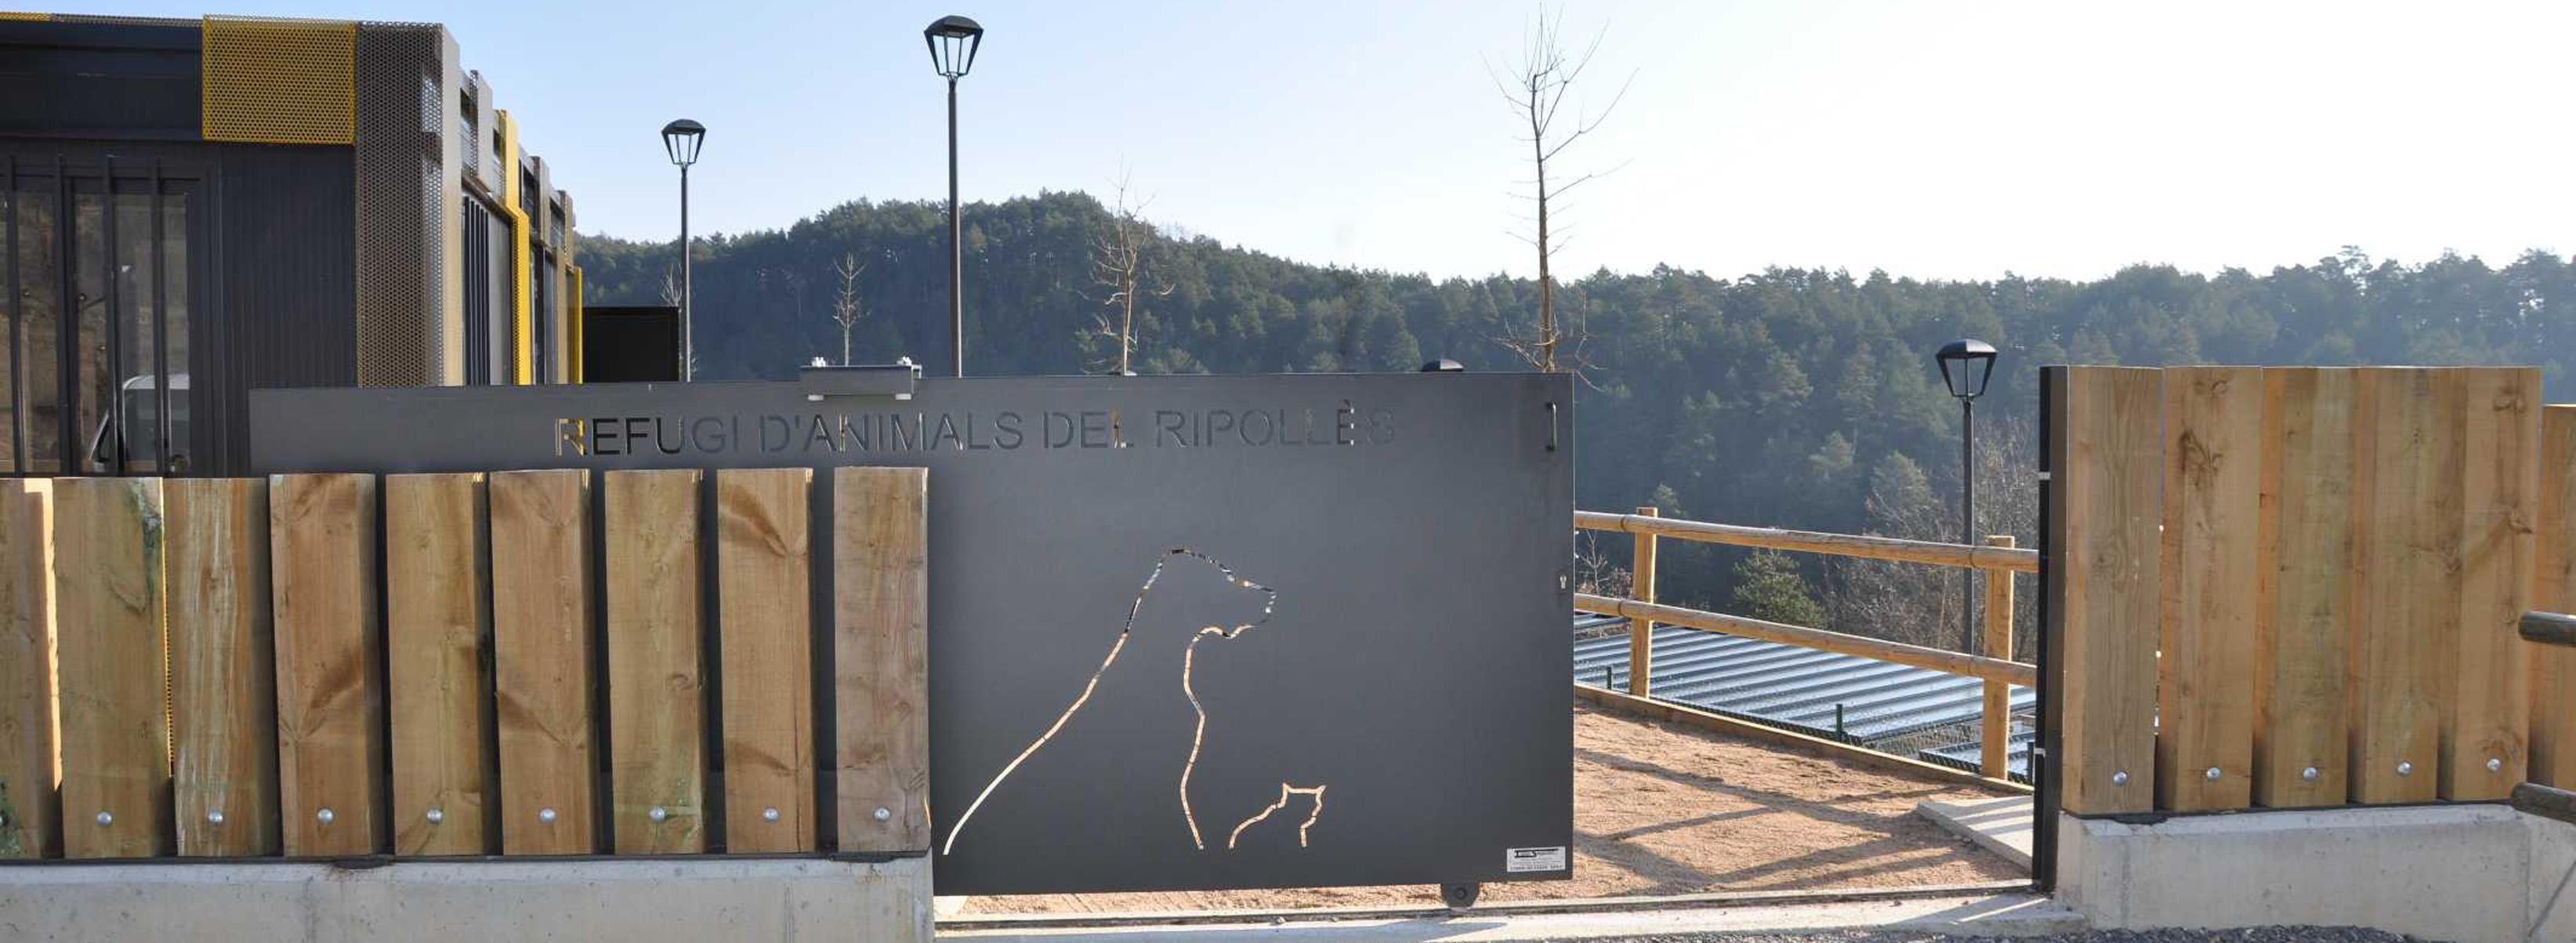 Refugi d'animals del Ripollès